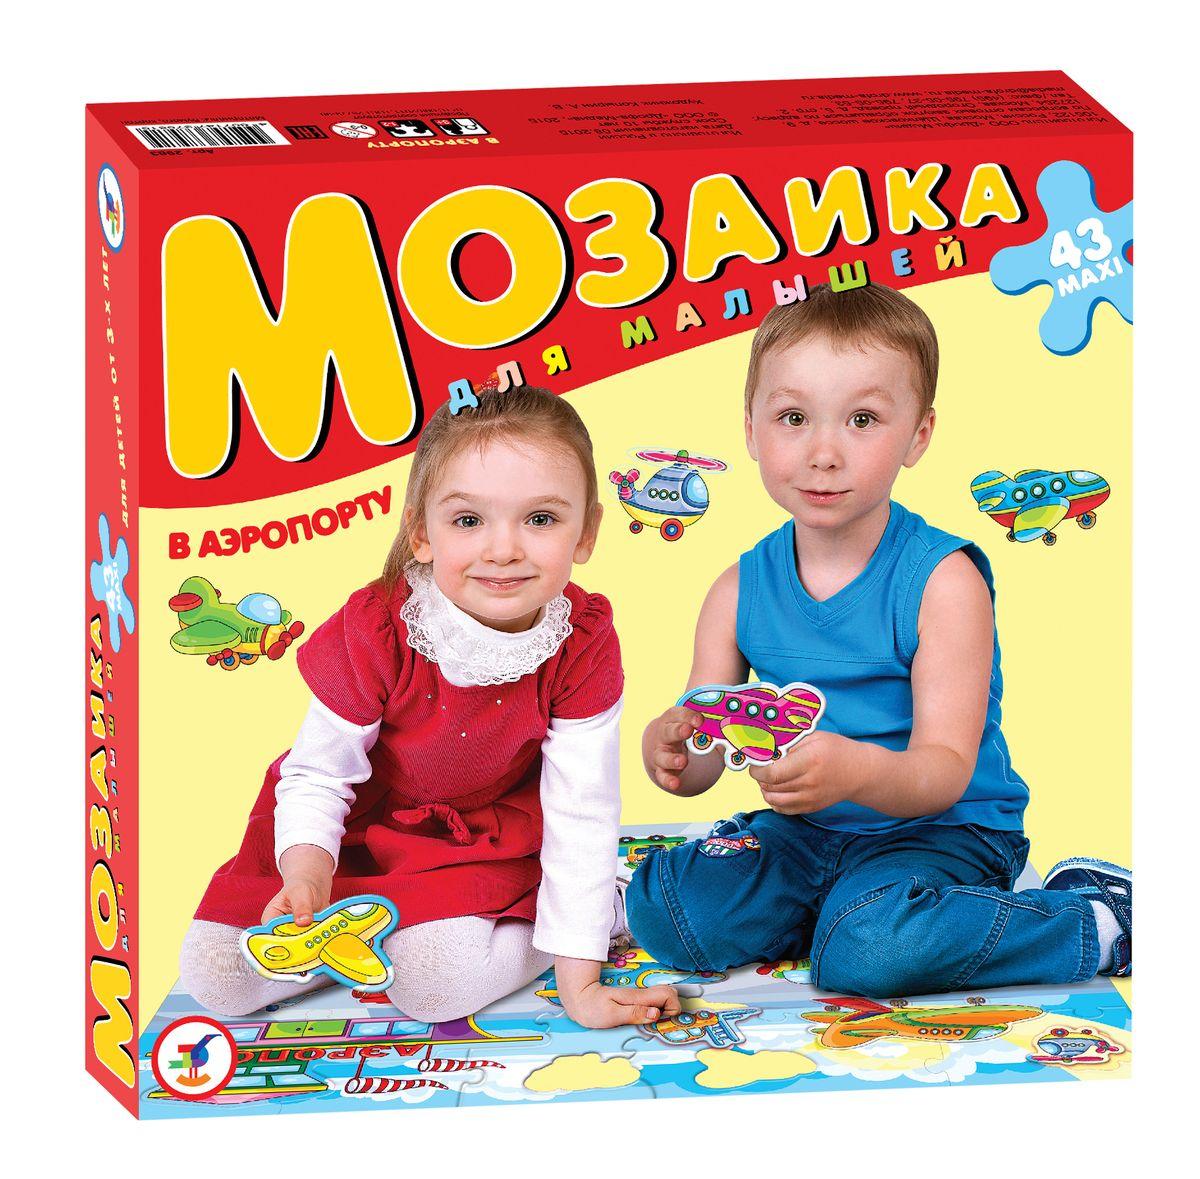 Дрофа-Медиа Пазл для малышей В аэропорту дрофа медиа пазл слоненок